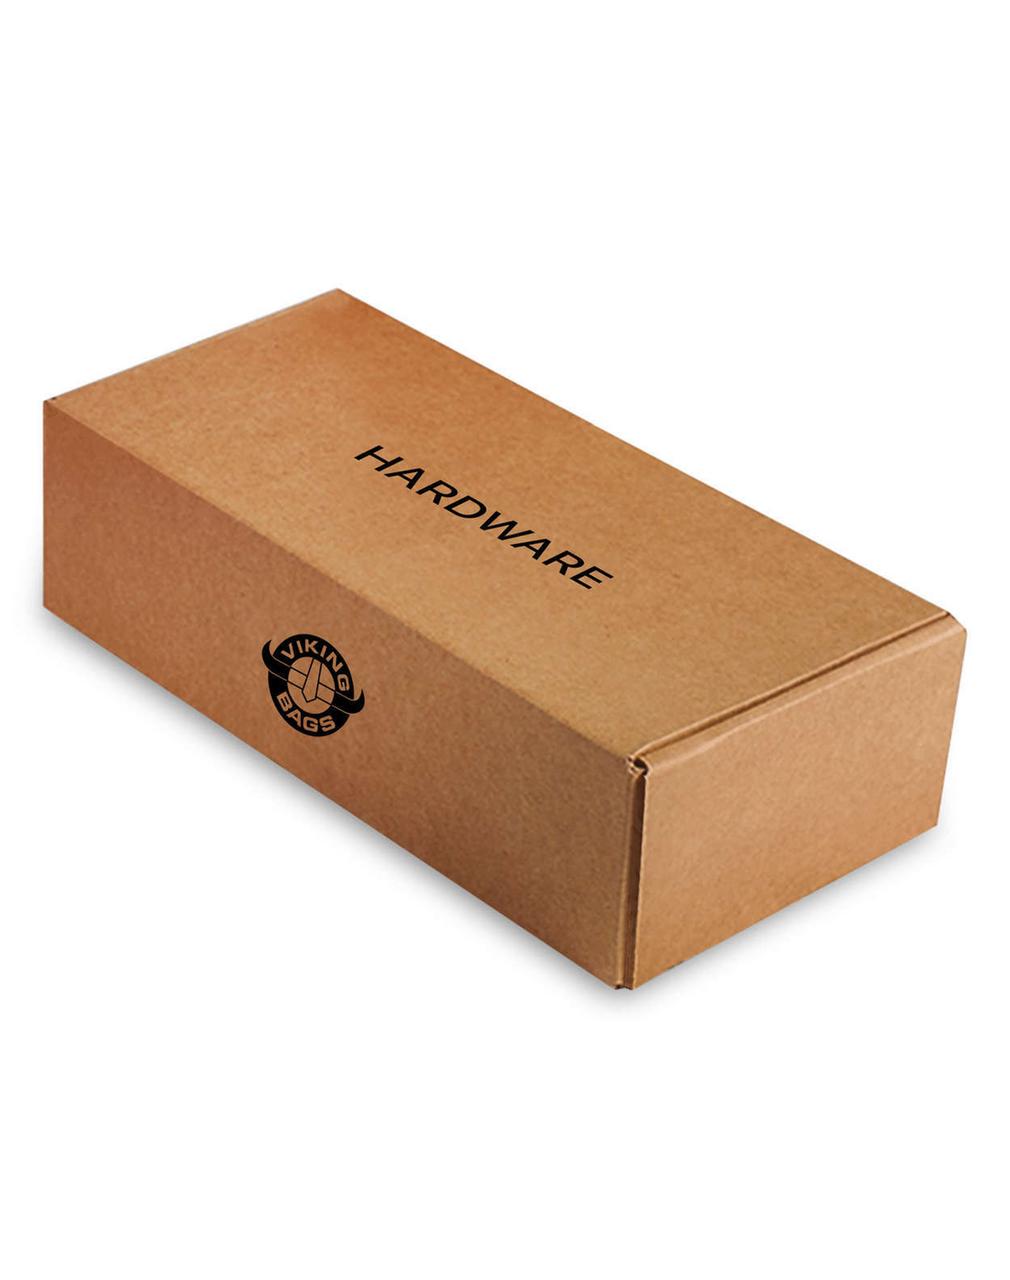 Honda 1100 Shadow Aero Charger Medium Slanted Motorcycle Saddlebags Box